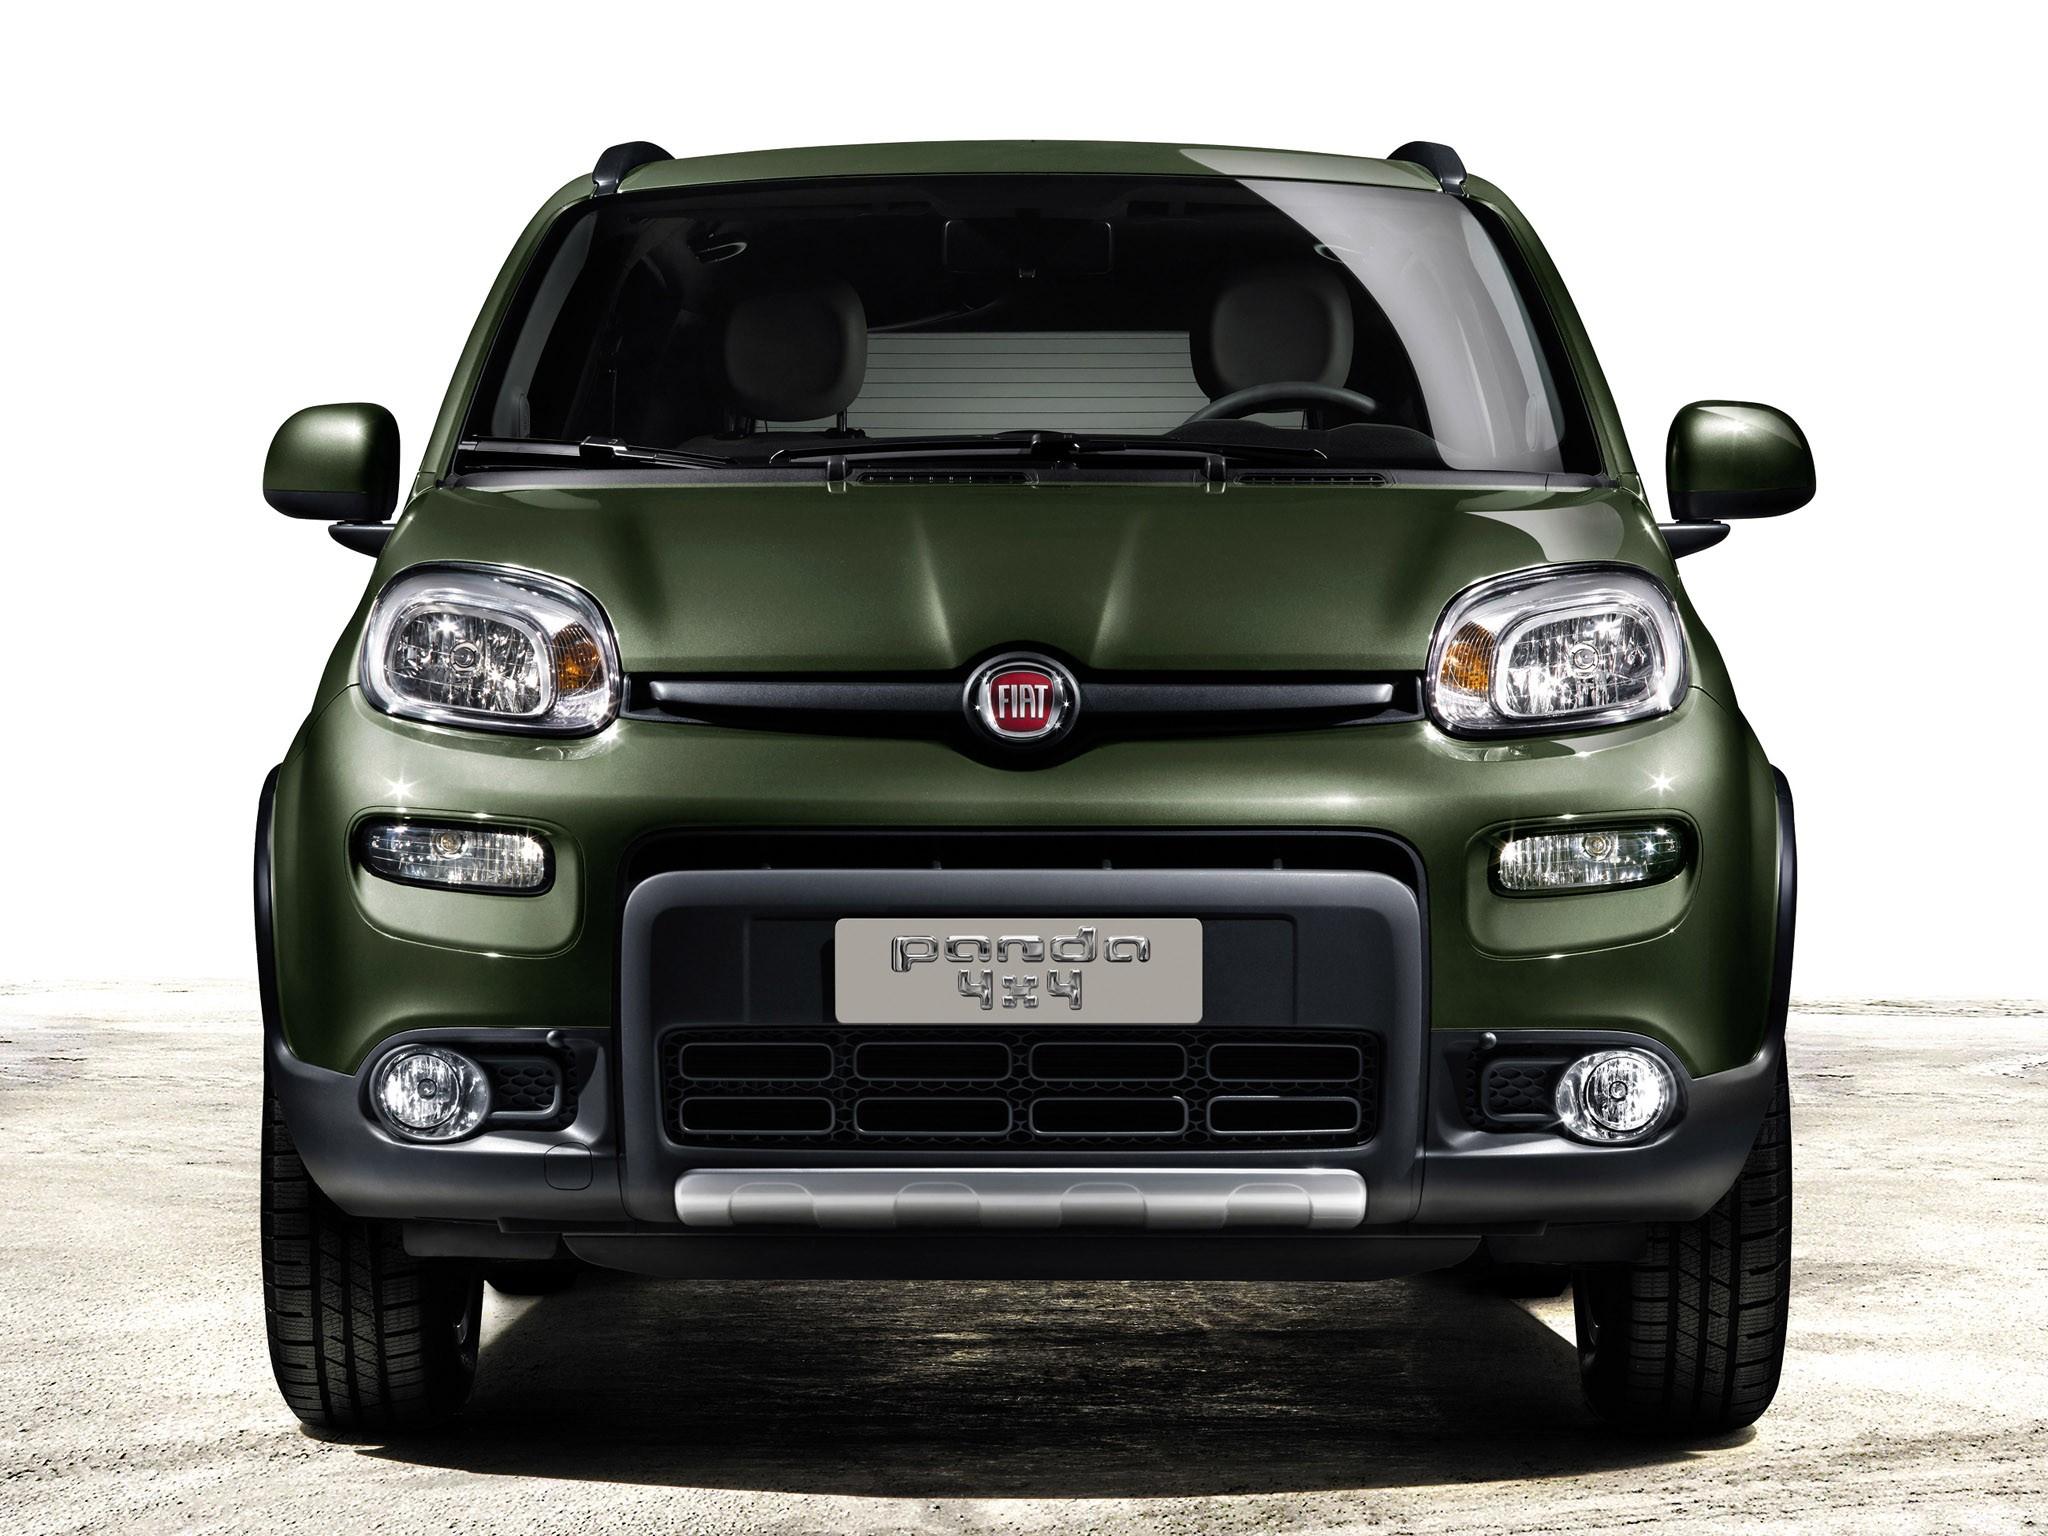 Fiat Panda 4x4 2012